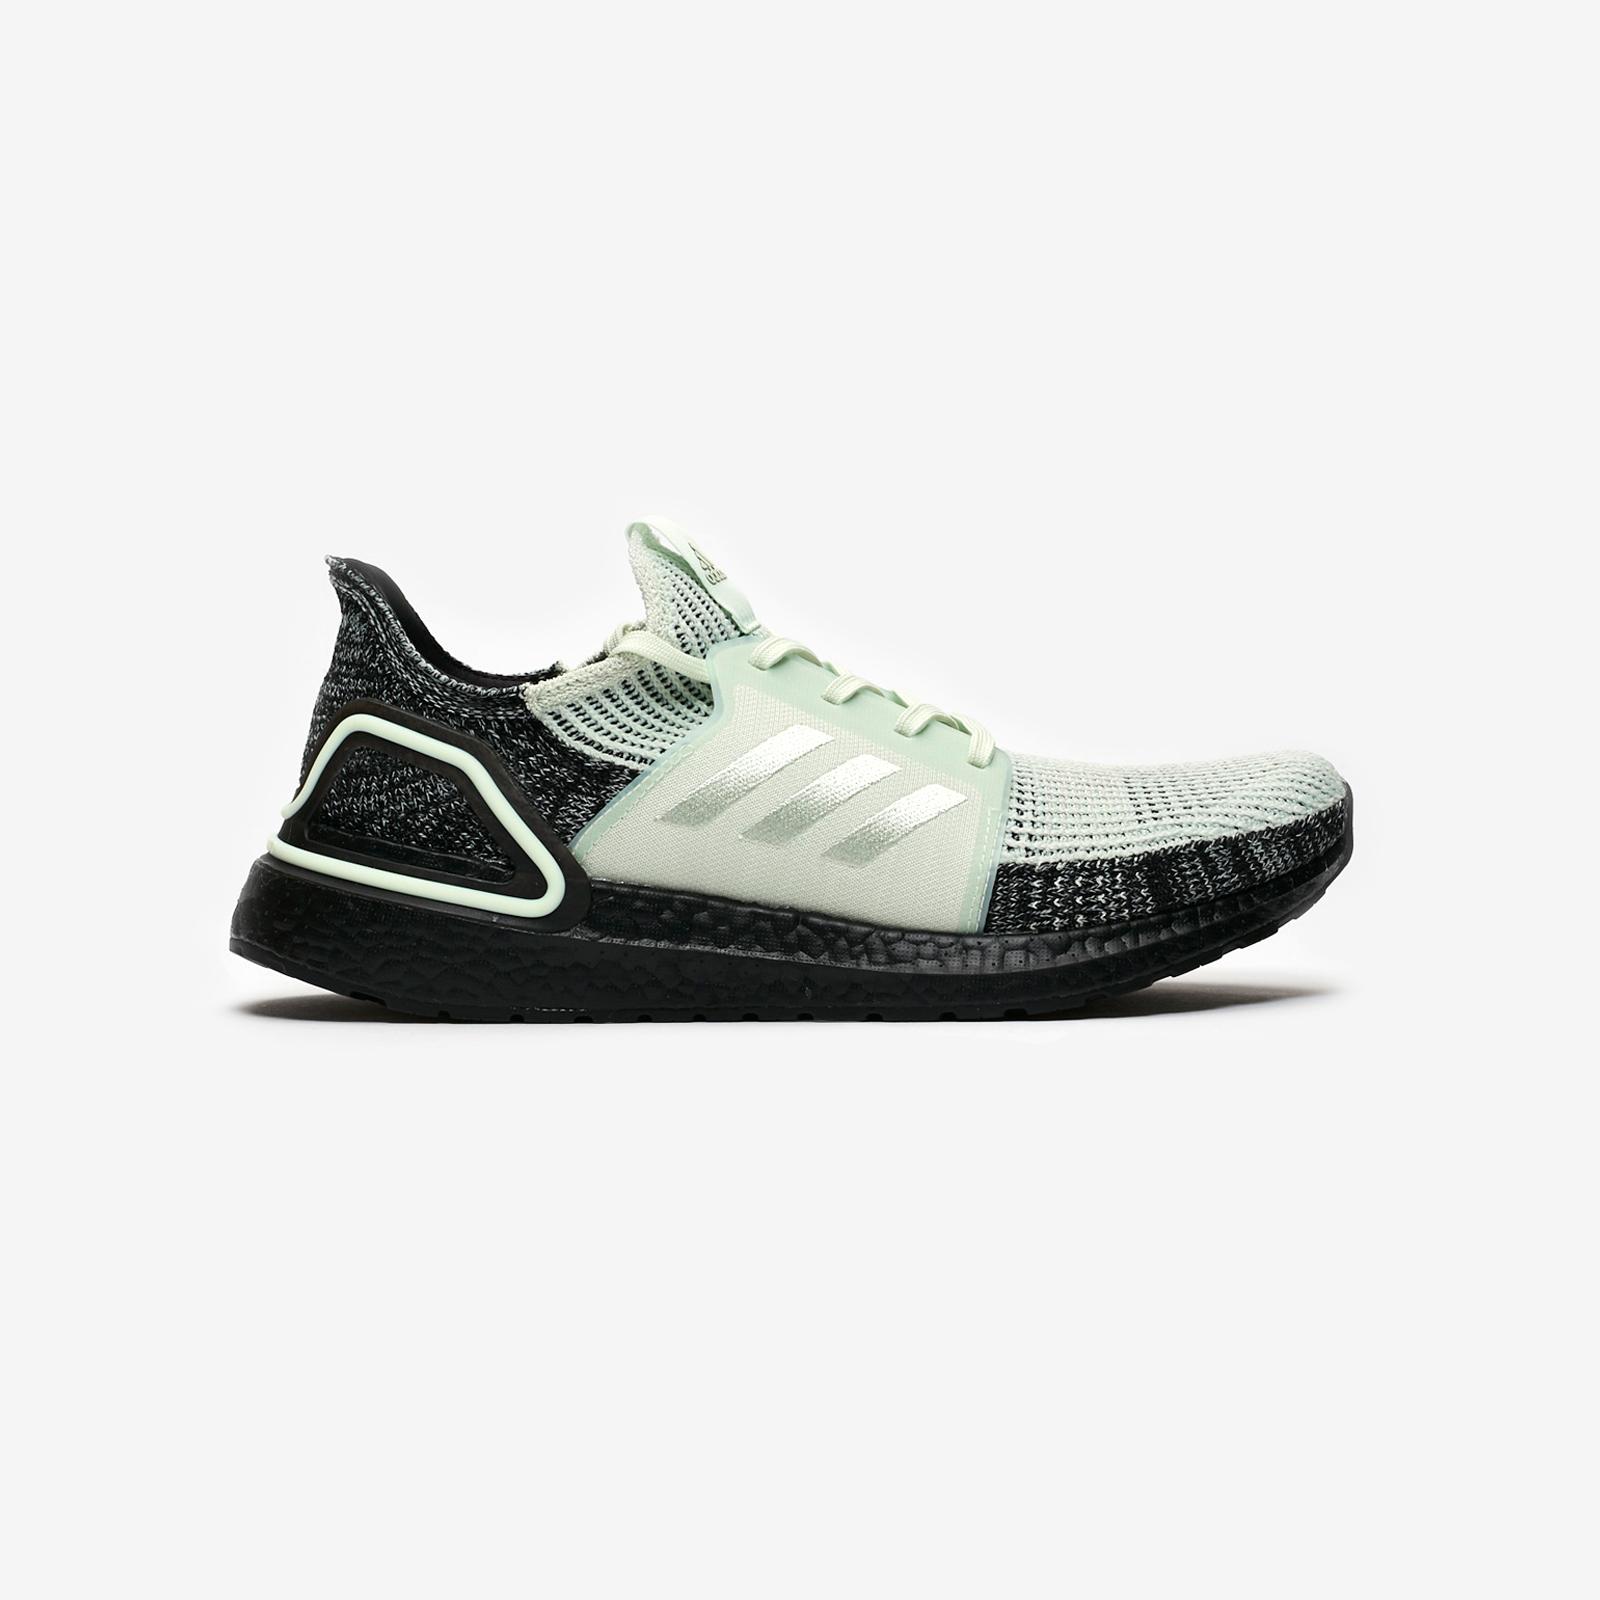 adidas Ultraboost 19 F34075 Sneakersnstuff I Sneakers